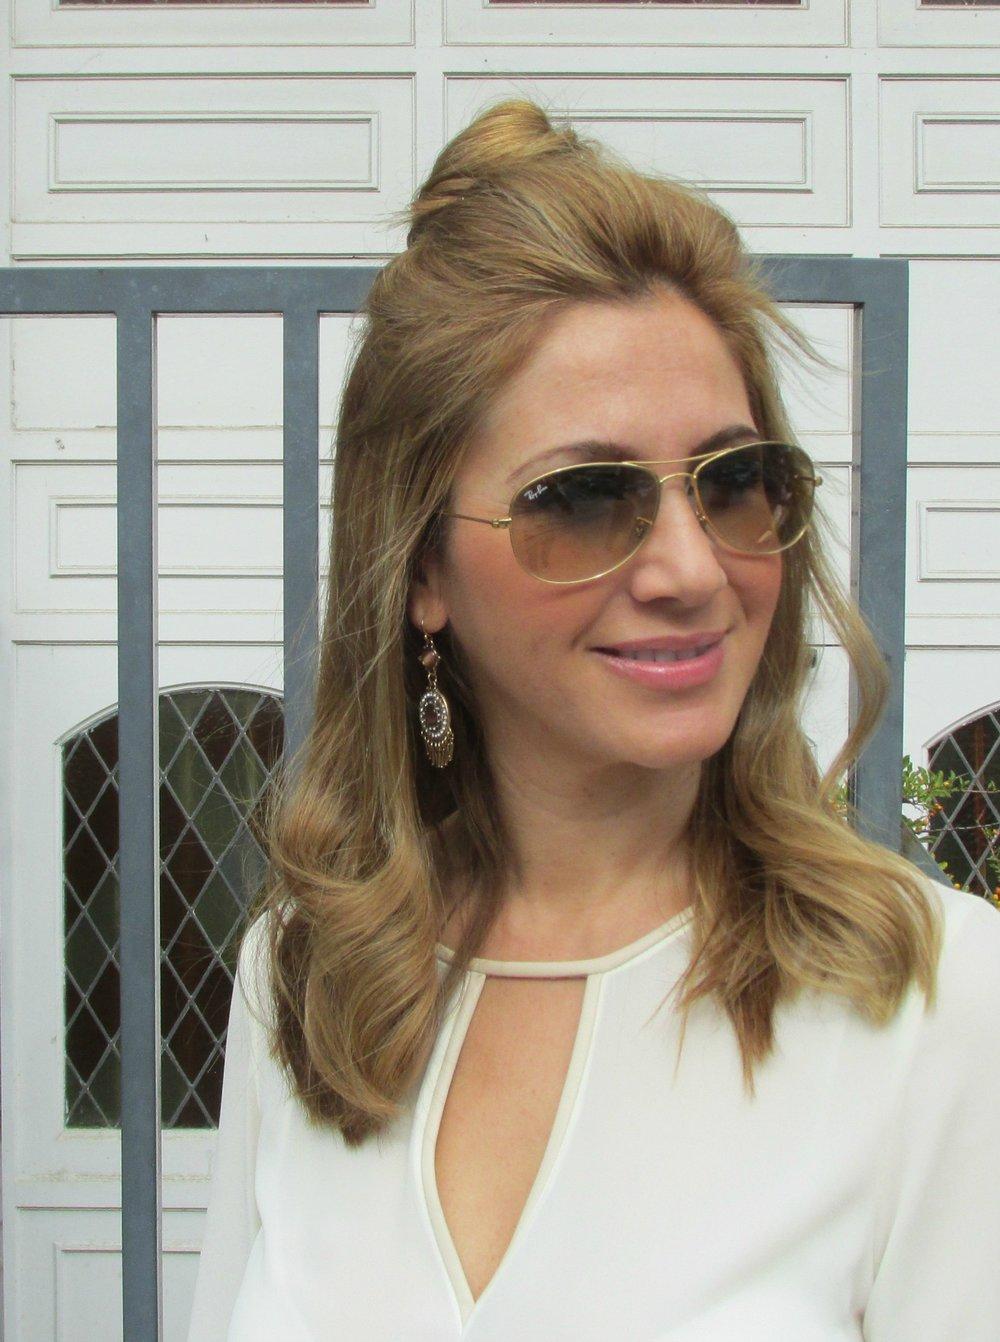 Camel skirt fashion blog 3